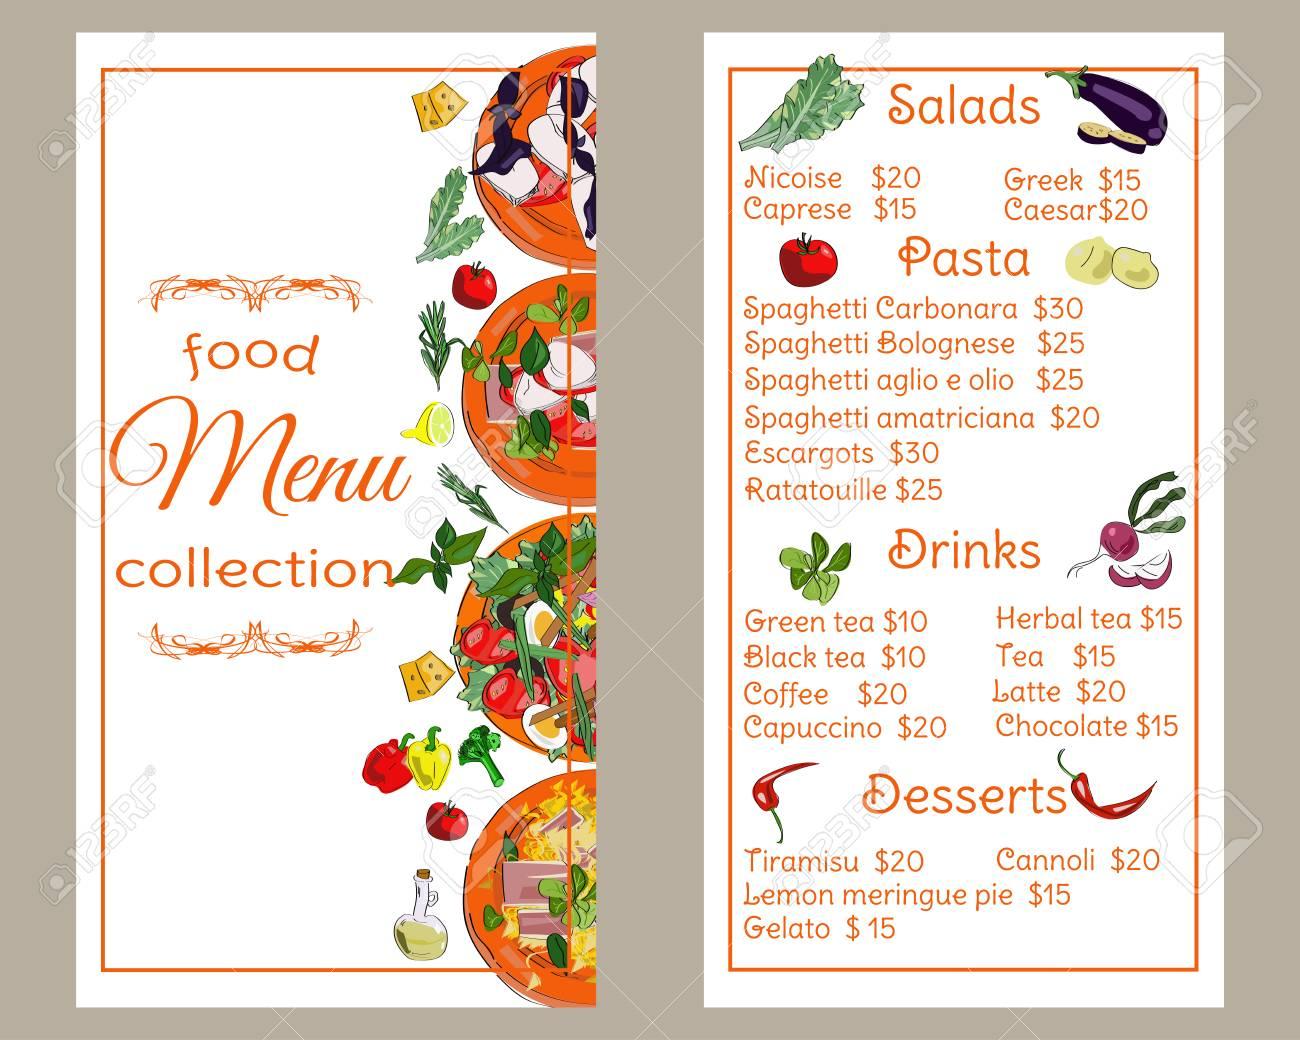 Restaurant Menu Design Templates | Restaurant Menu Vertical Template Food Menu Design Vector Drawn